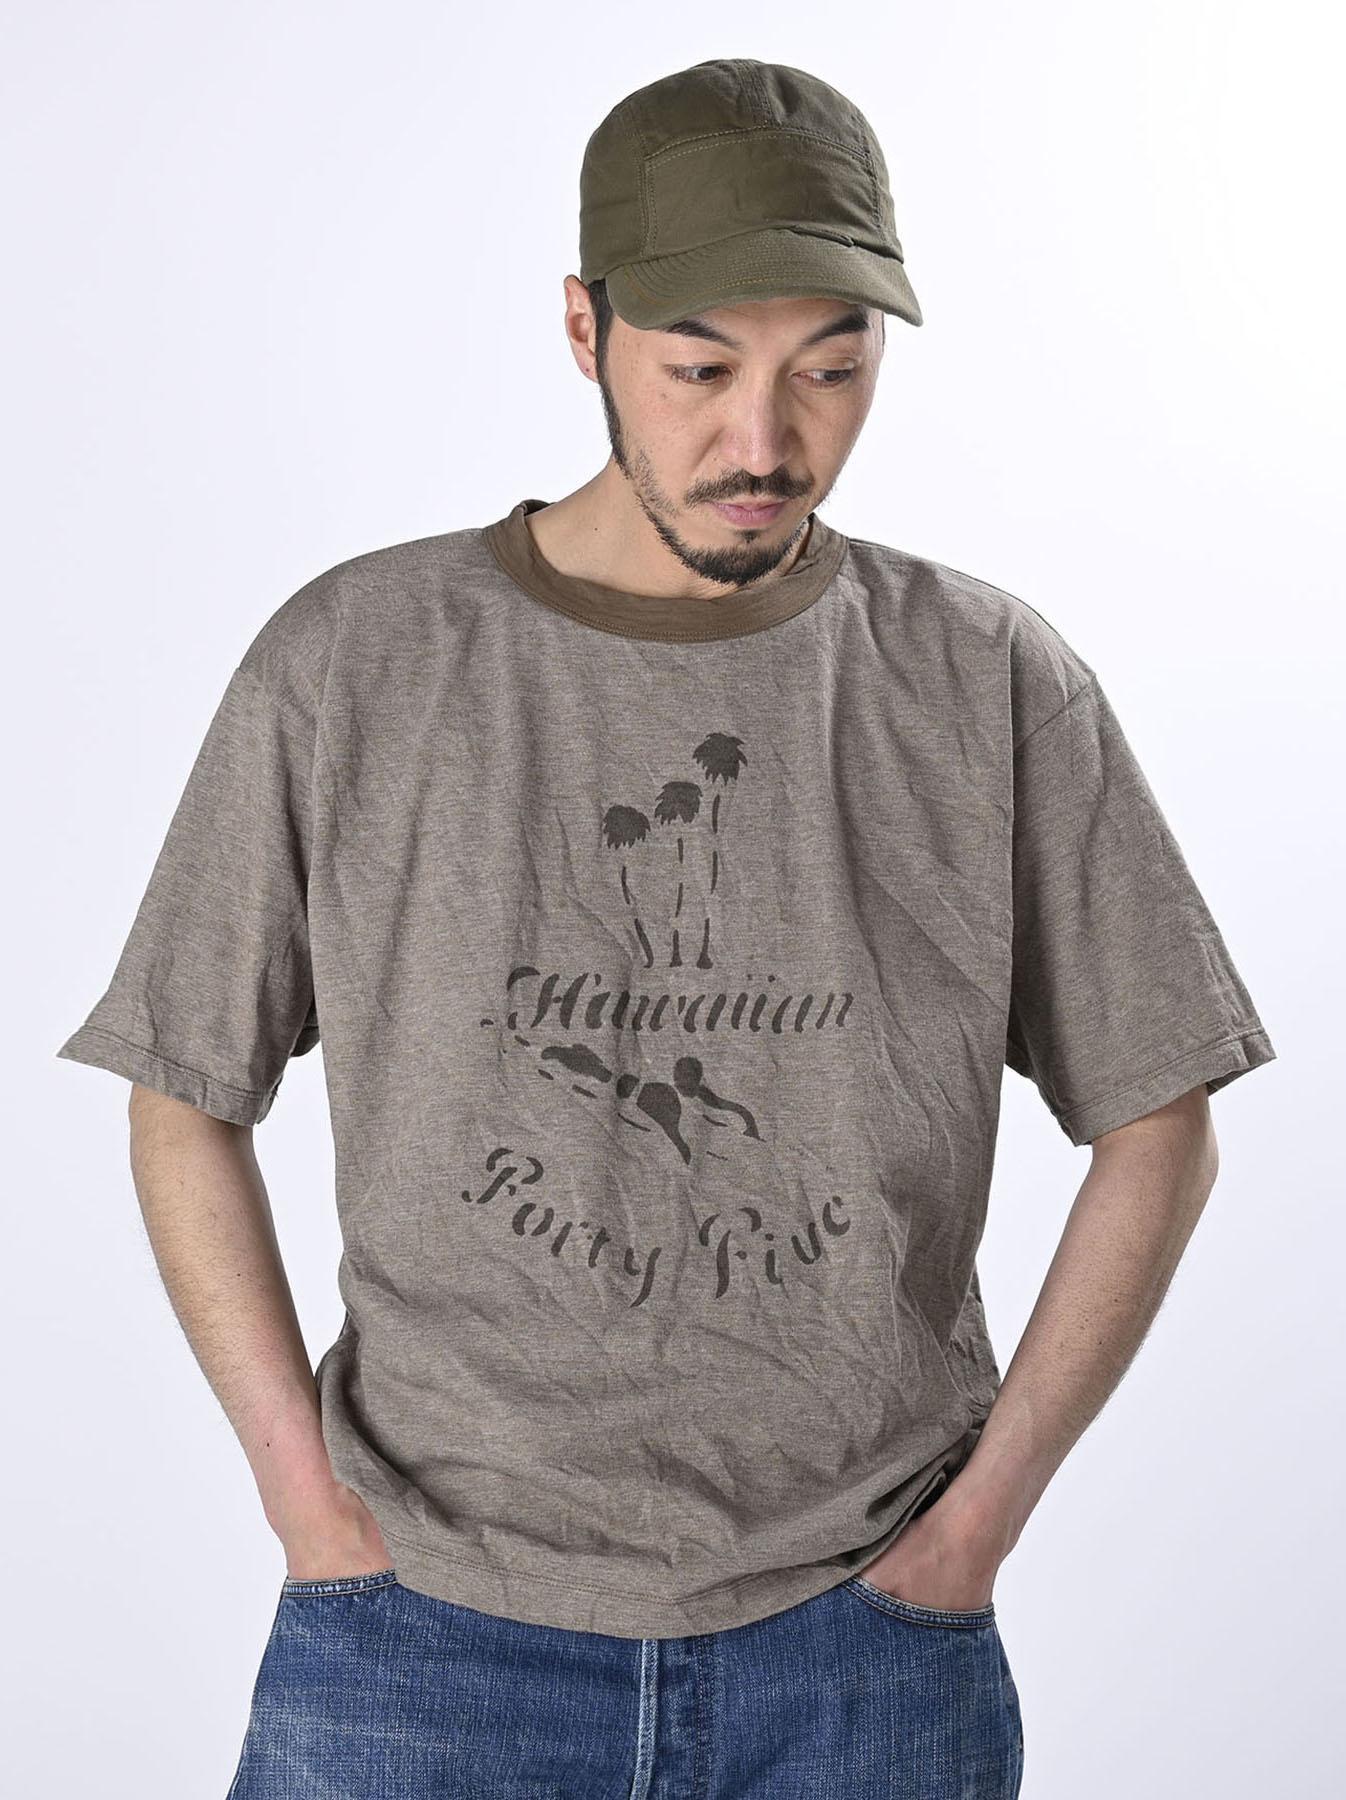 US Tenjiku Paddling 908 Ocean T-Shirt (0521)-4